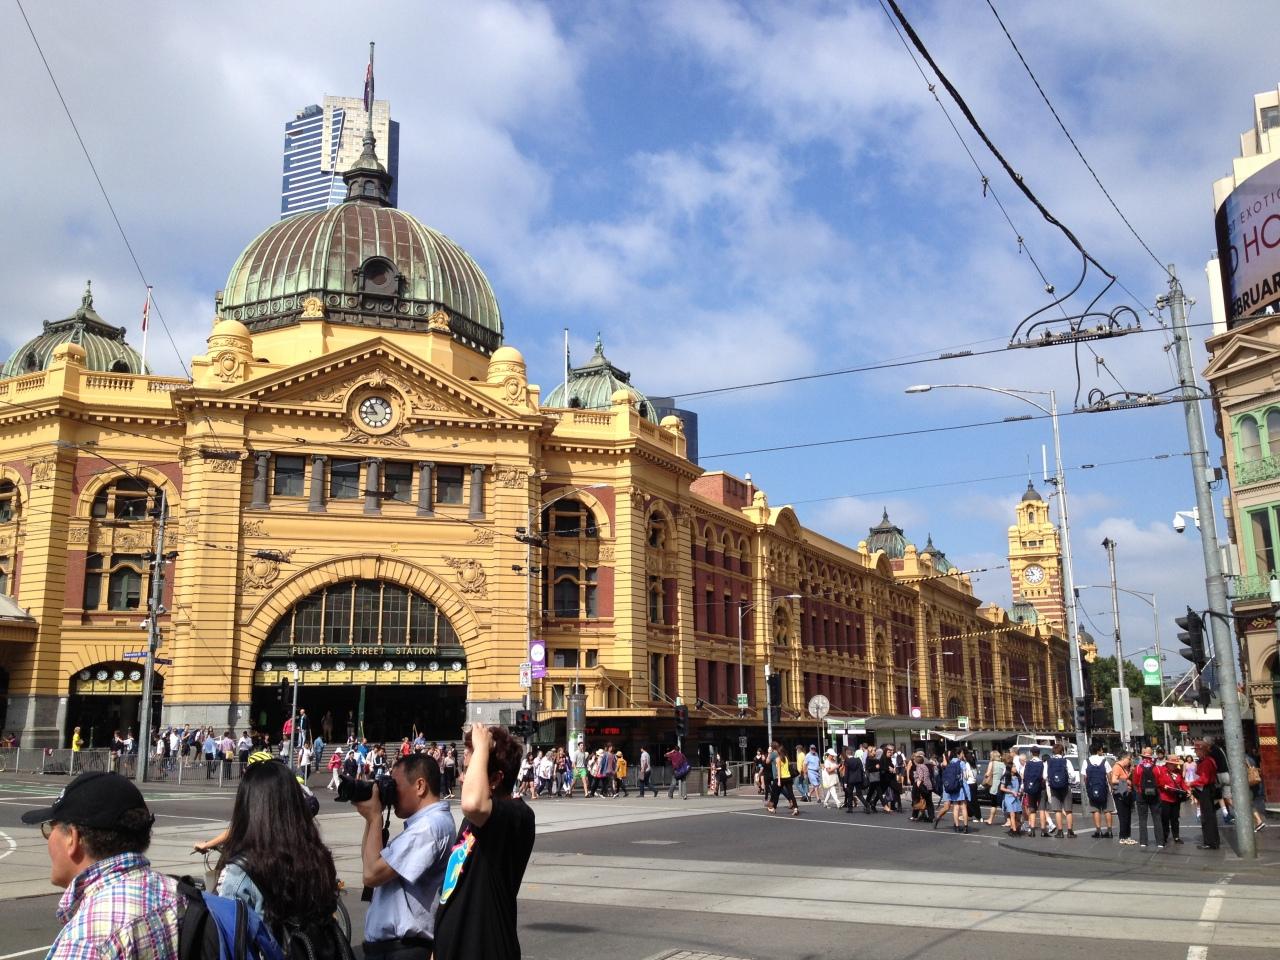 Melbourne….Melbs….Meh